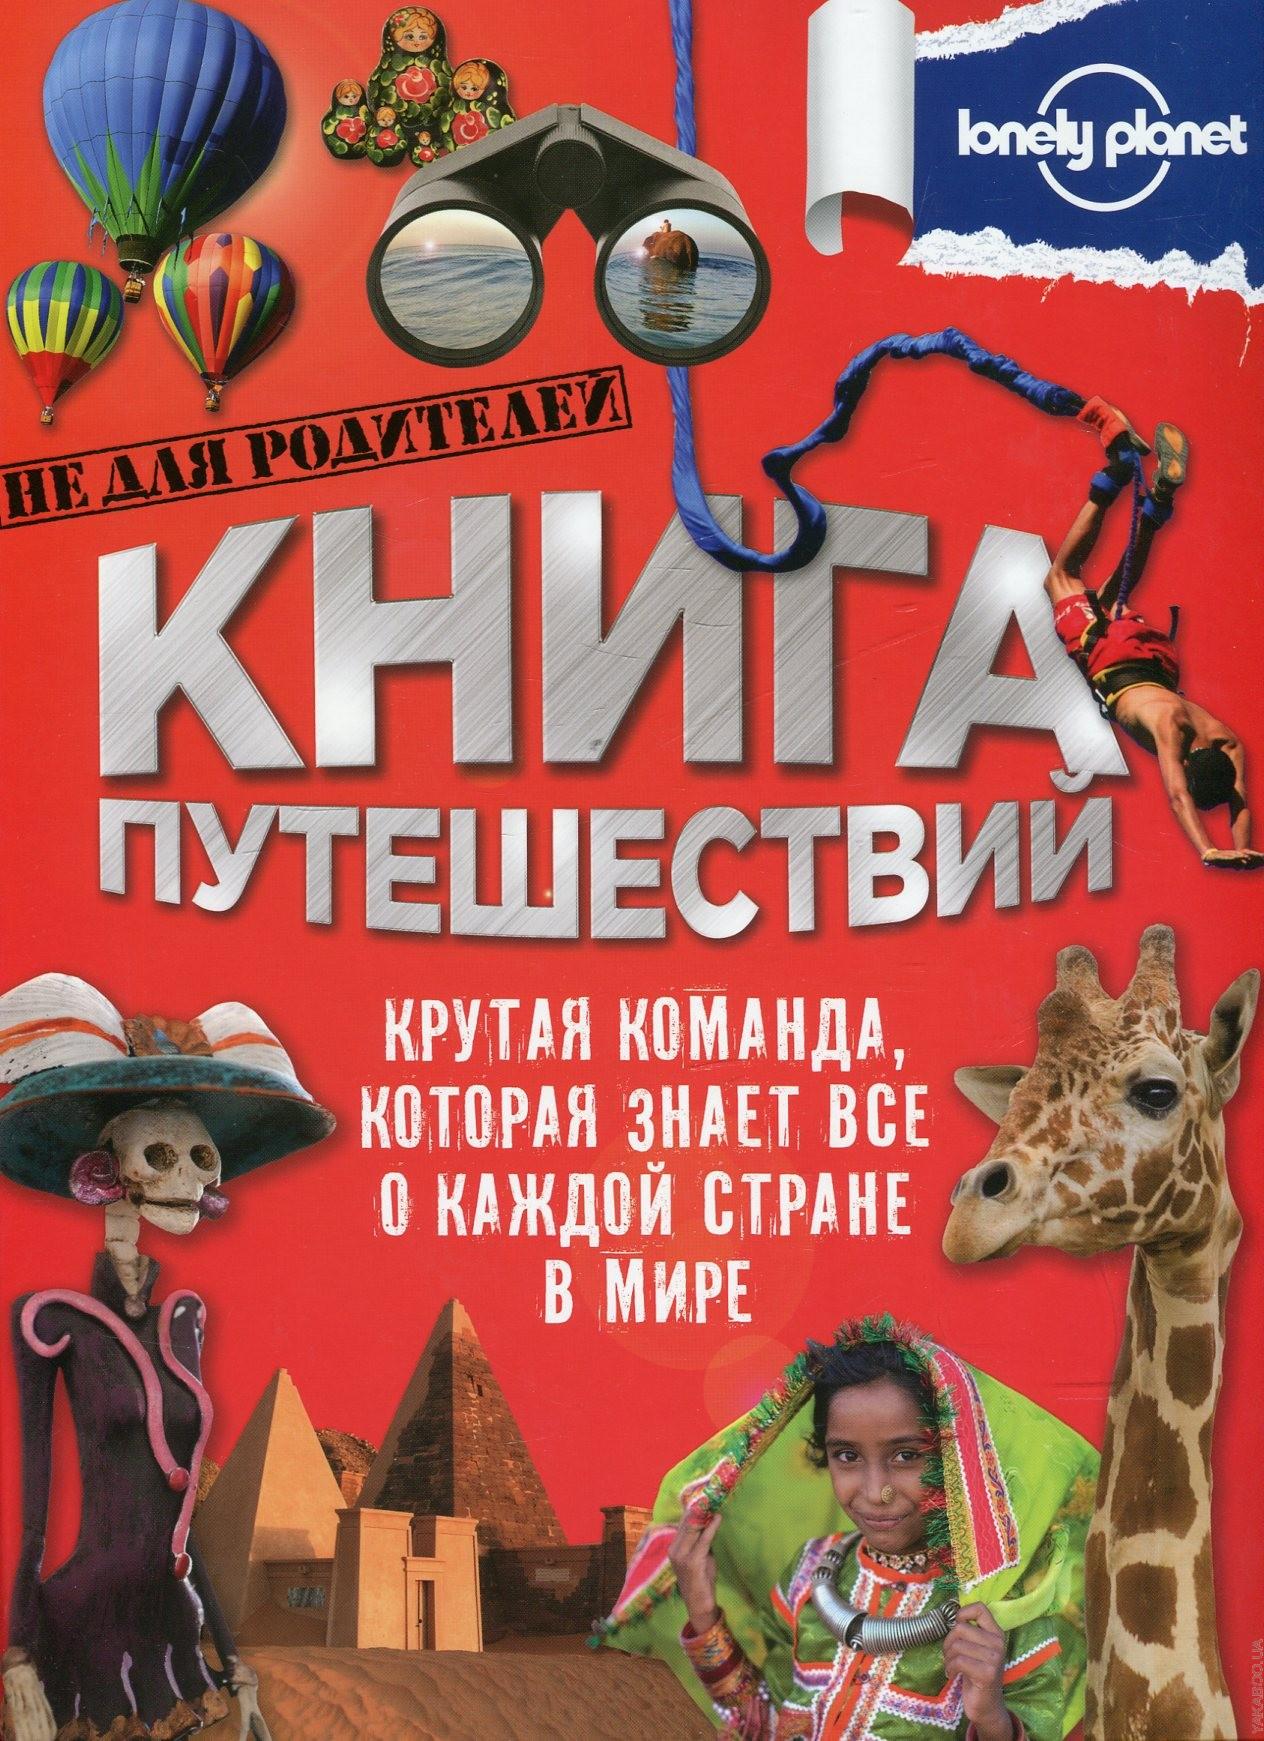 Книга путешествий